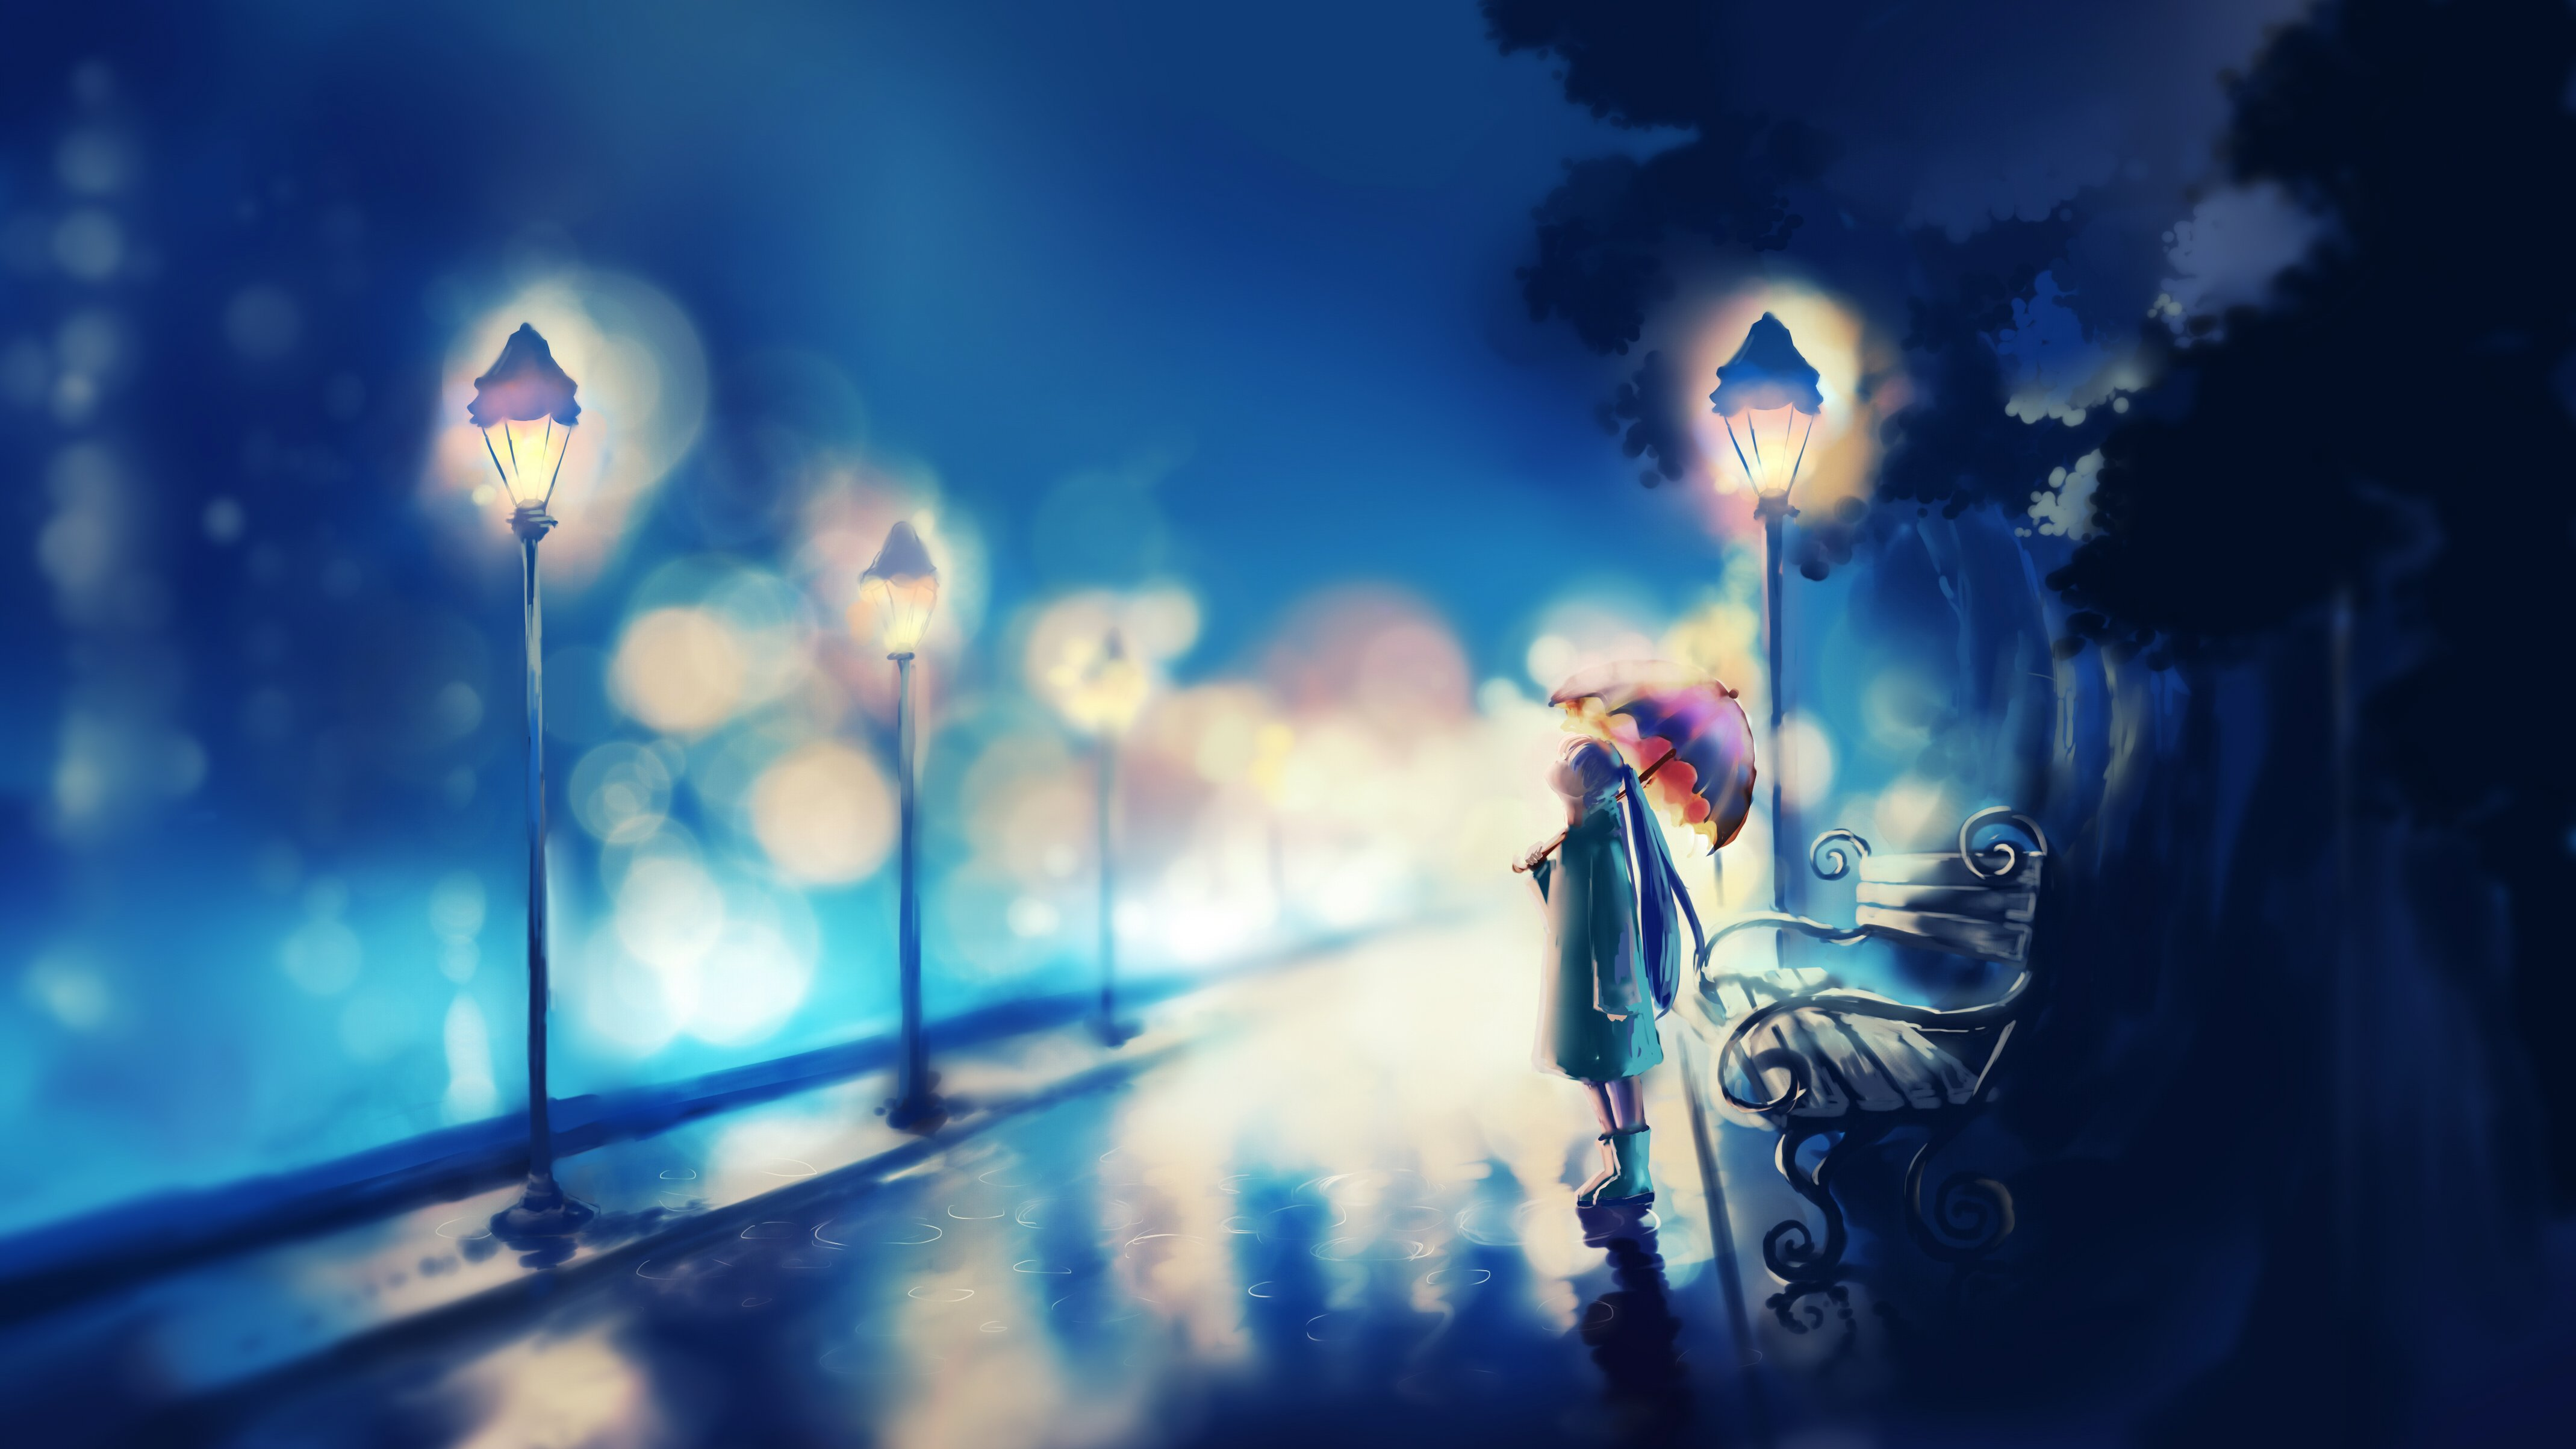 Saint Seiya 3d Live Wallpaper Original Umbrella Red Alone Girl Blue Anime Wallpaper